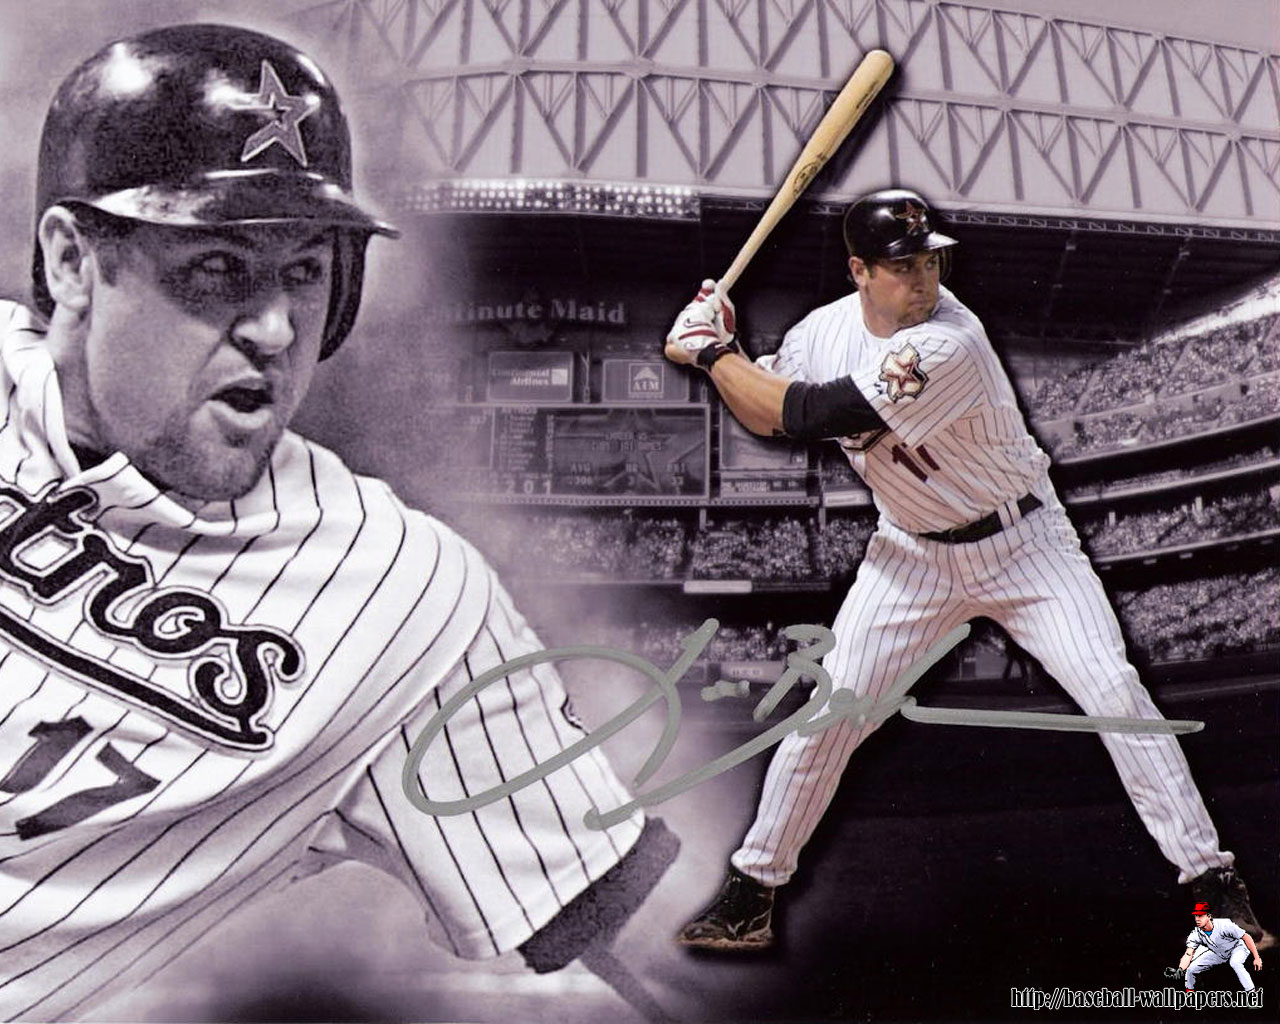 Baseball player wallpapers xc 4 1280x1024